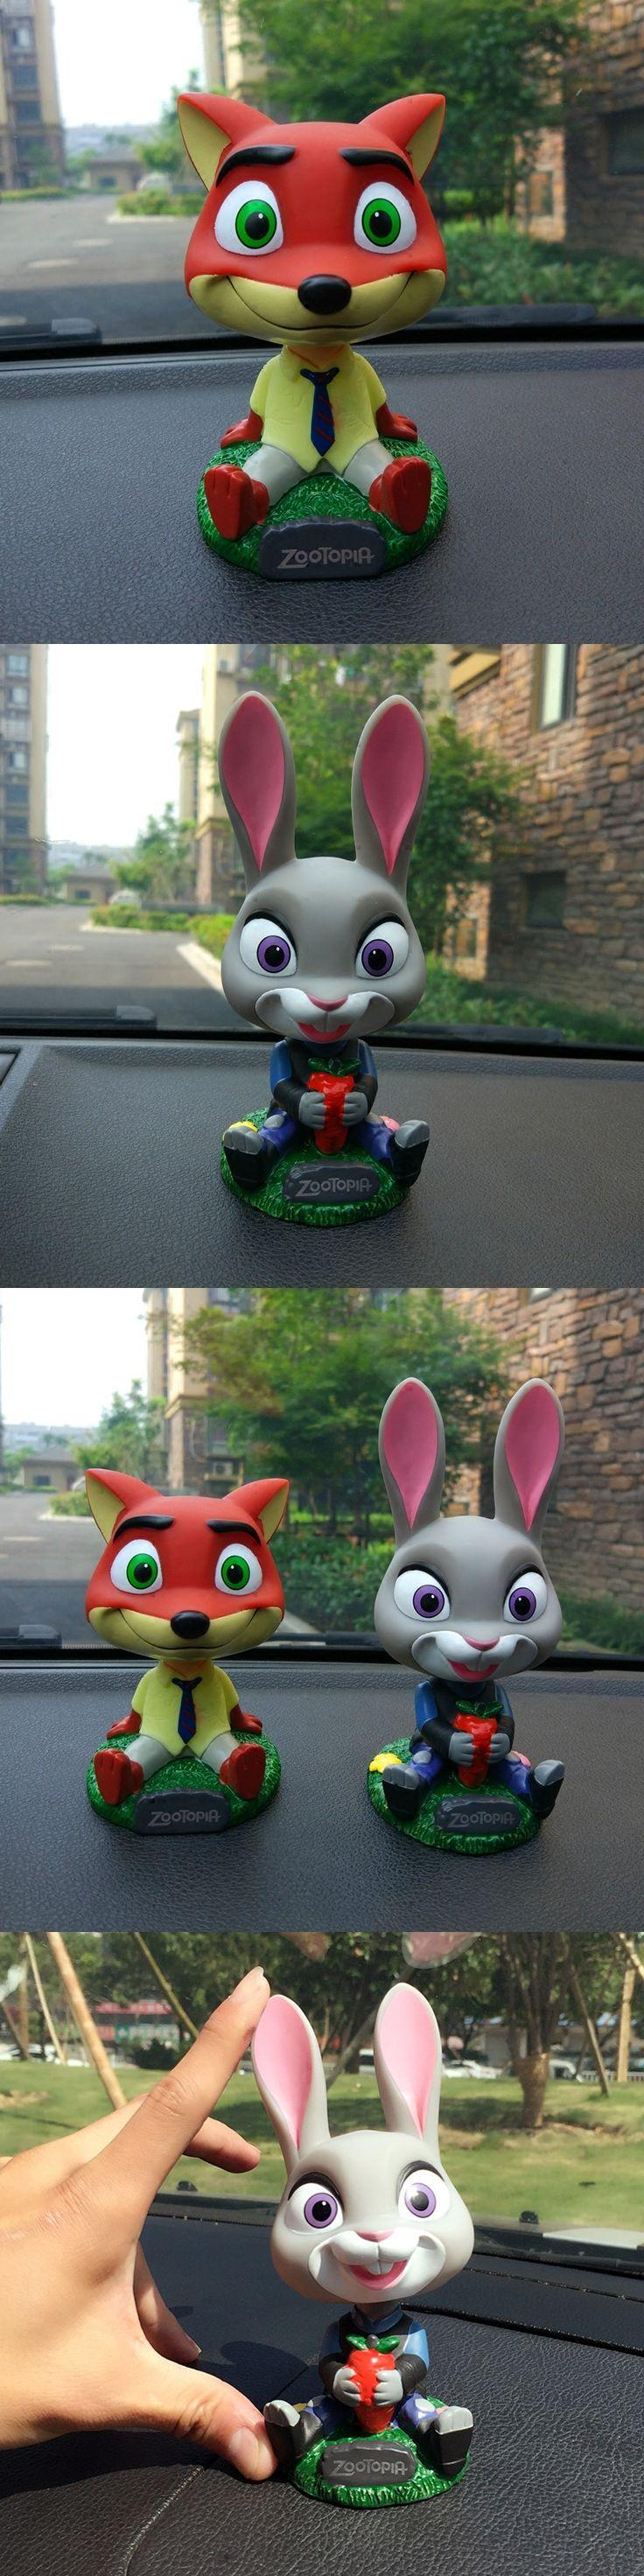 Zootopia Rabbit Judy Fox Nick Shake Head Ornament Car Decor Head Shaking Toys Auto Ornament Decoration